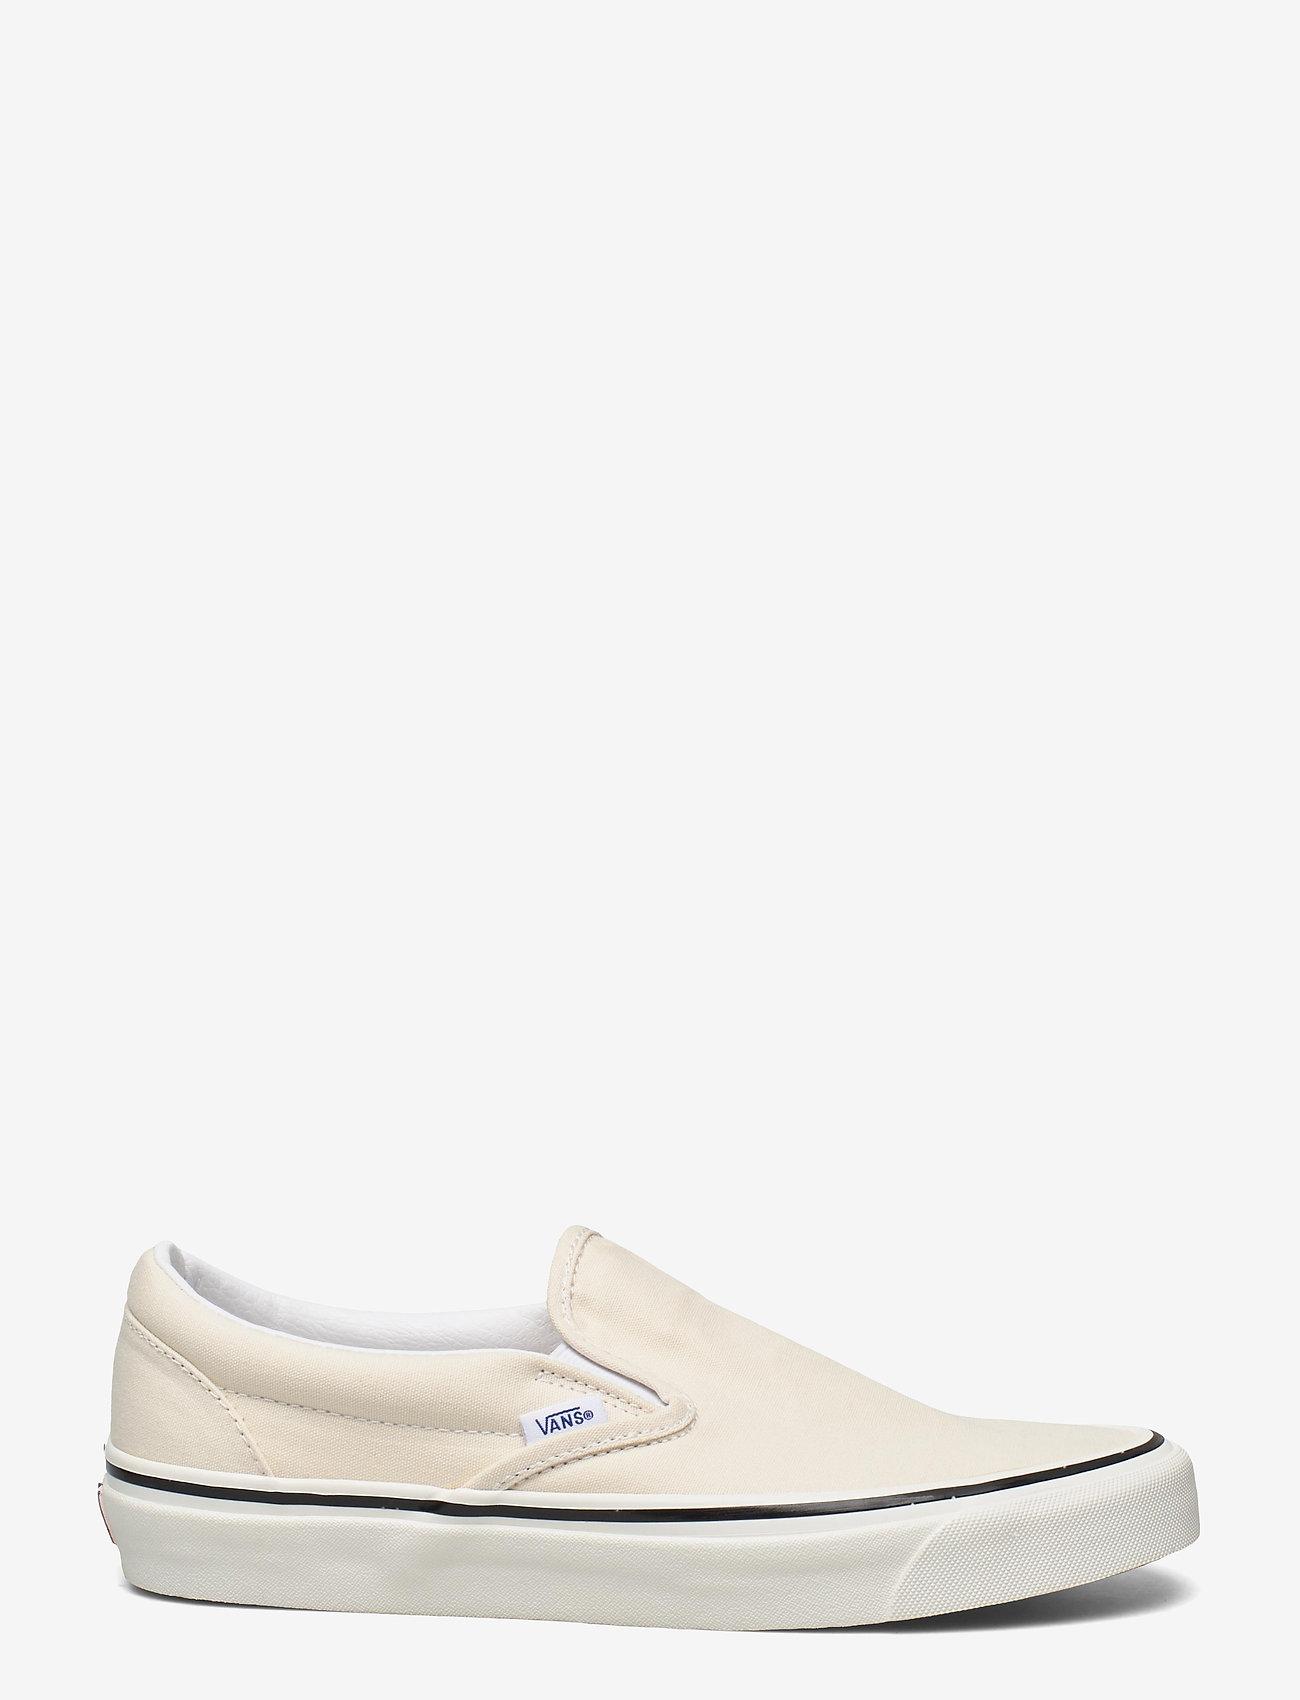 VANS - Shoe Adult Unisex Numeric Wid - slip-on schoenen - (anaheim factory)og white - 1